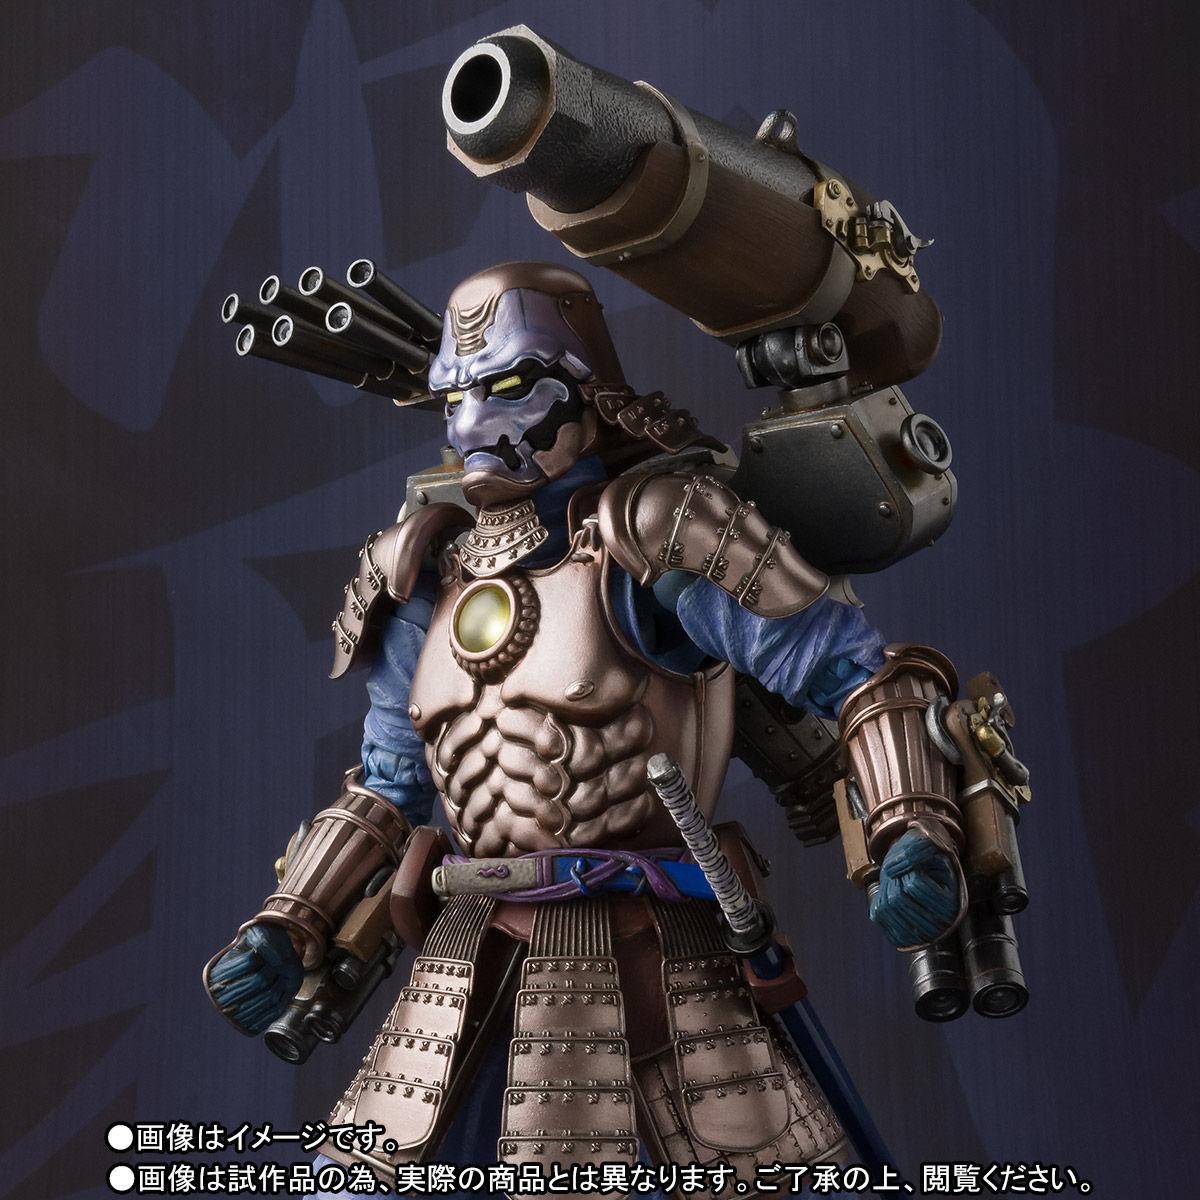 Meishou MANGA REALIZATION - Koutetsu Samurai War Machine (Limited Pre-order)